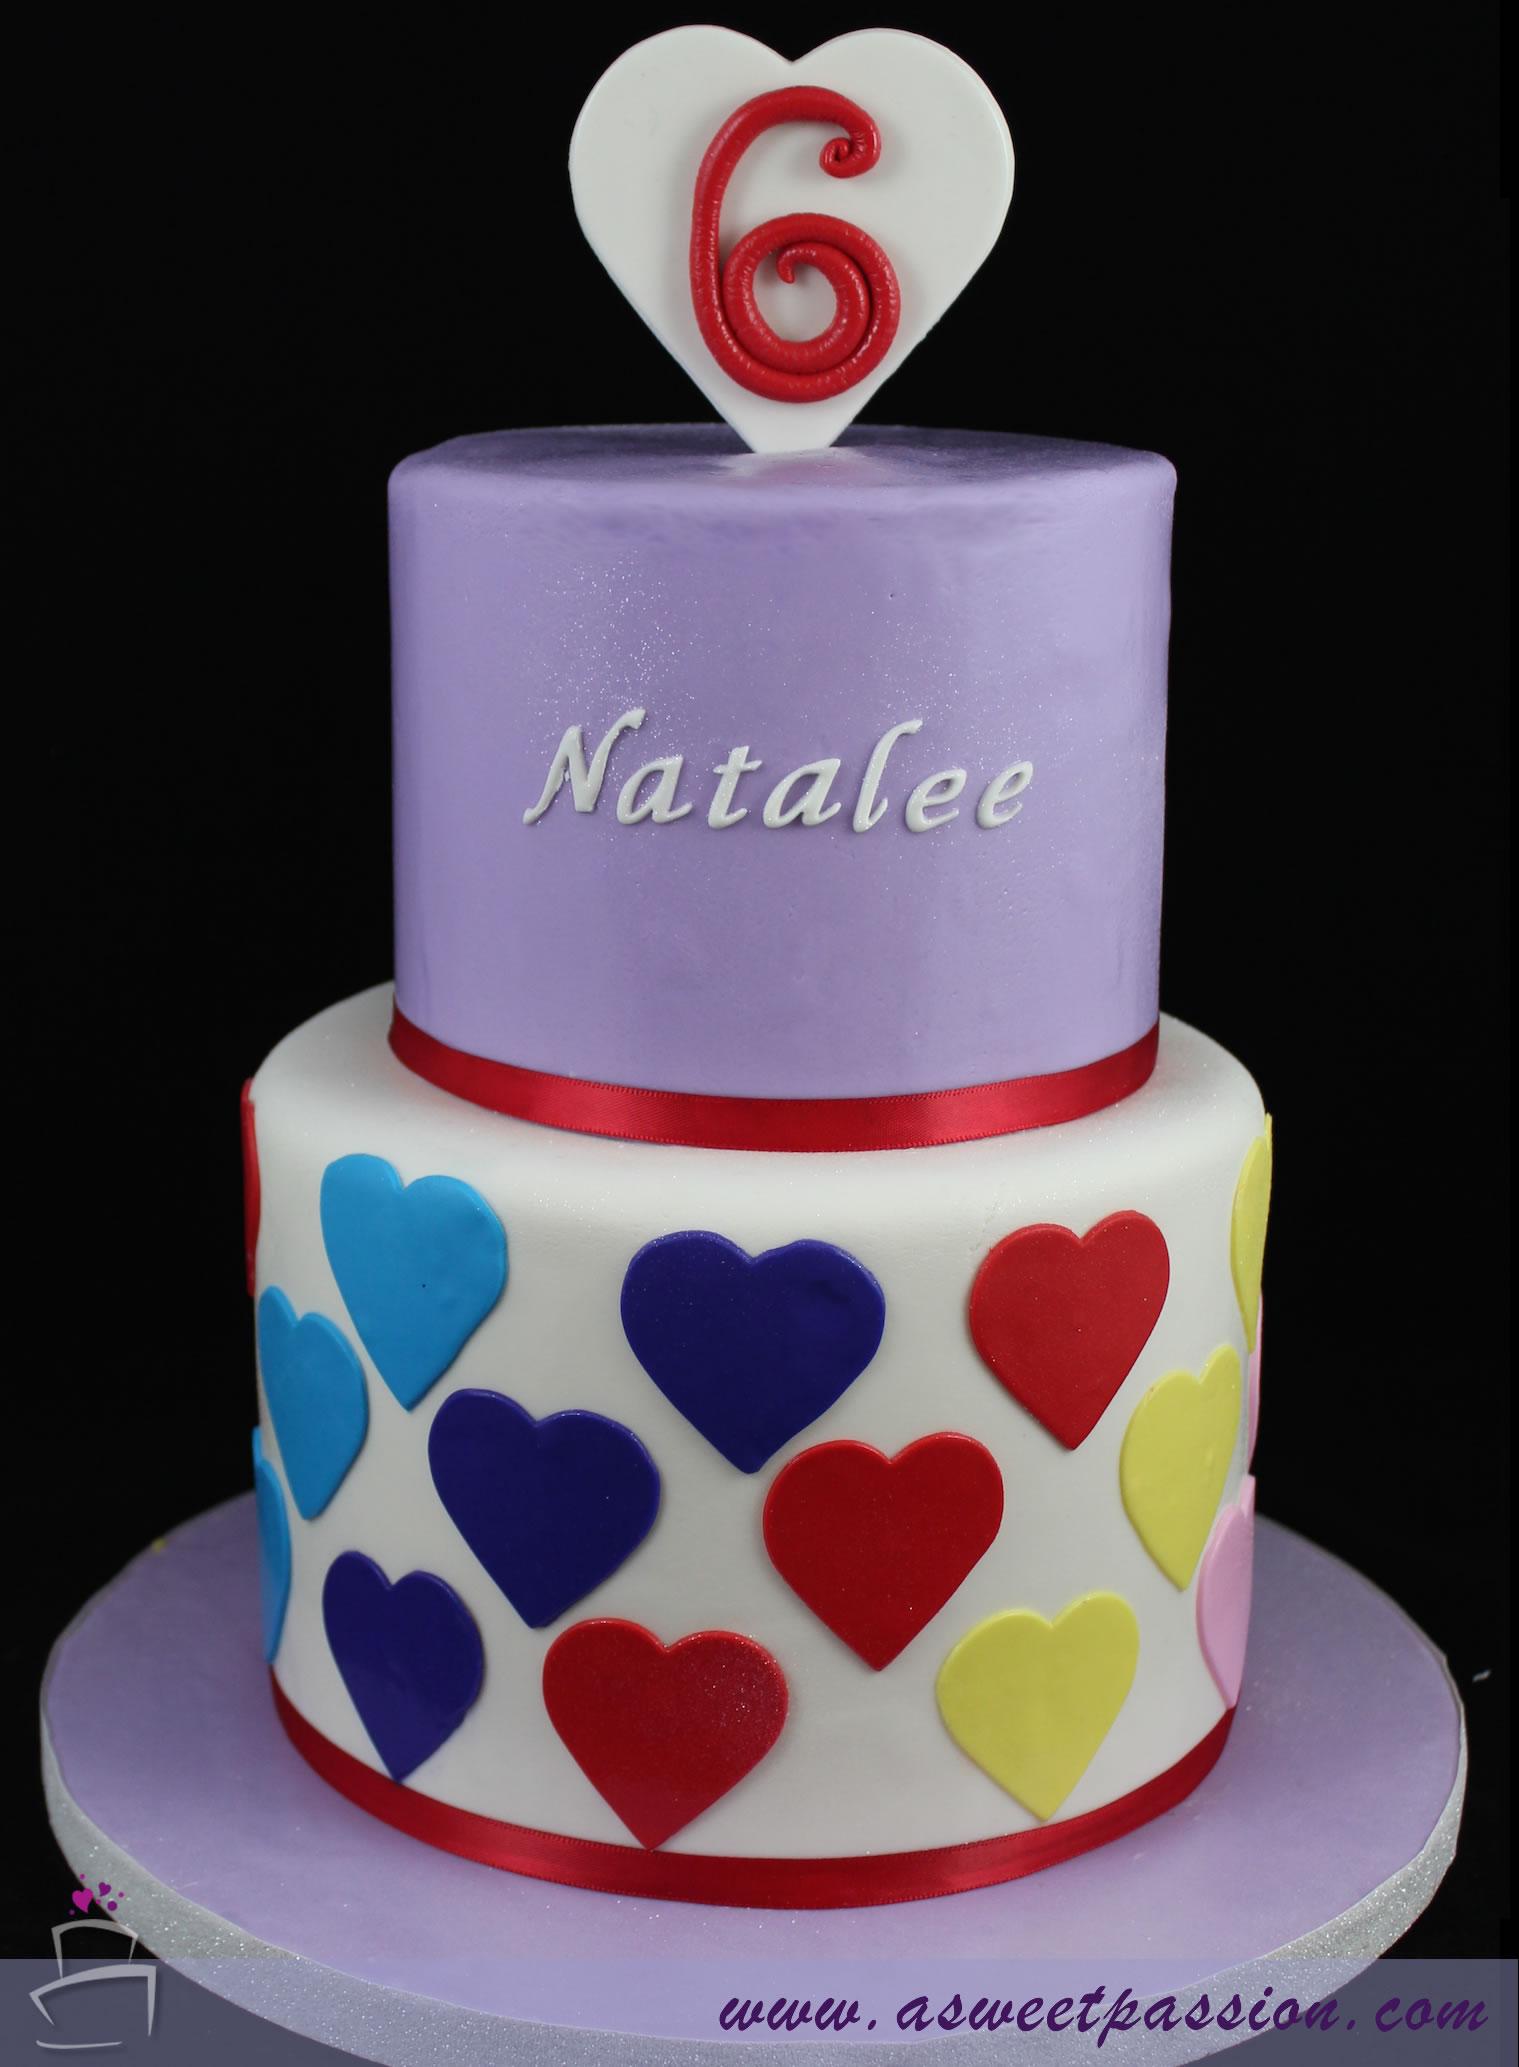 Groovy Rainbow 6Th Birthday Cake Sweet Passion Cakery Funny Birthday Cards Online Barepcheapnameinfo